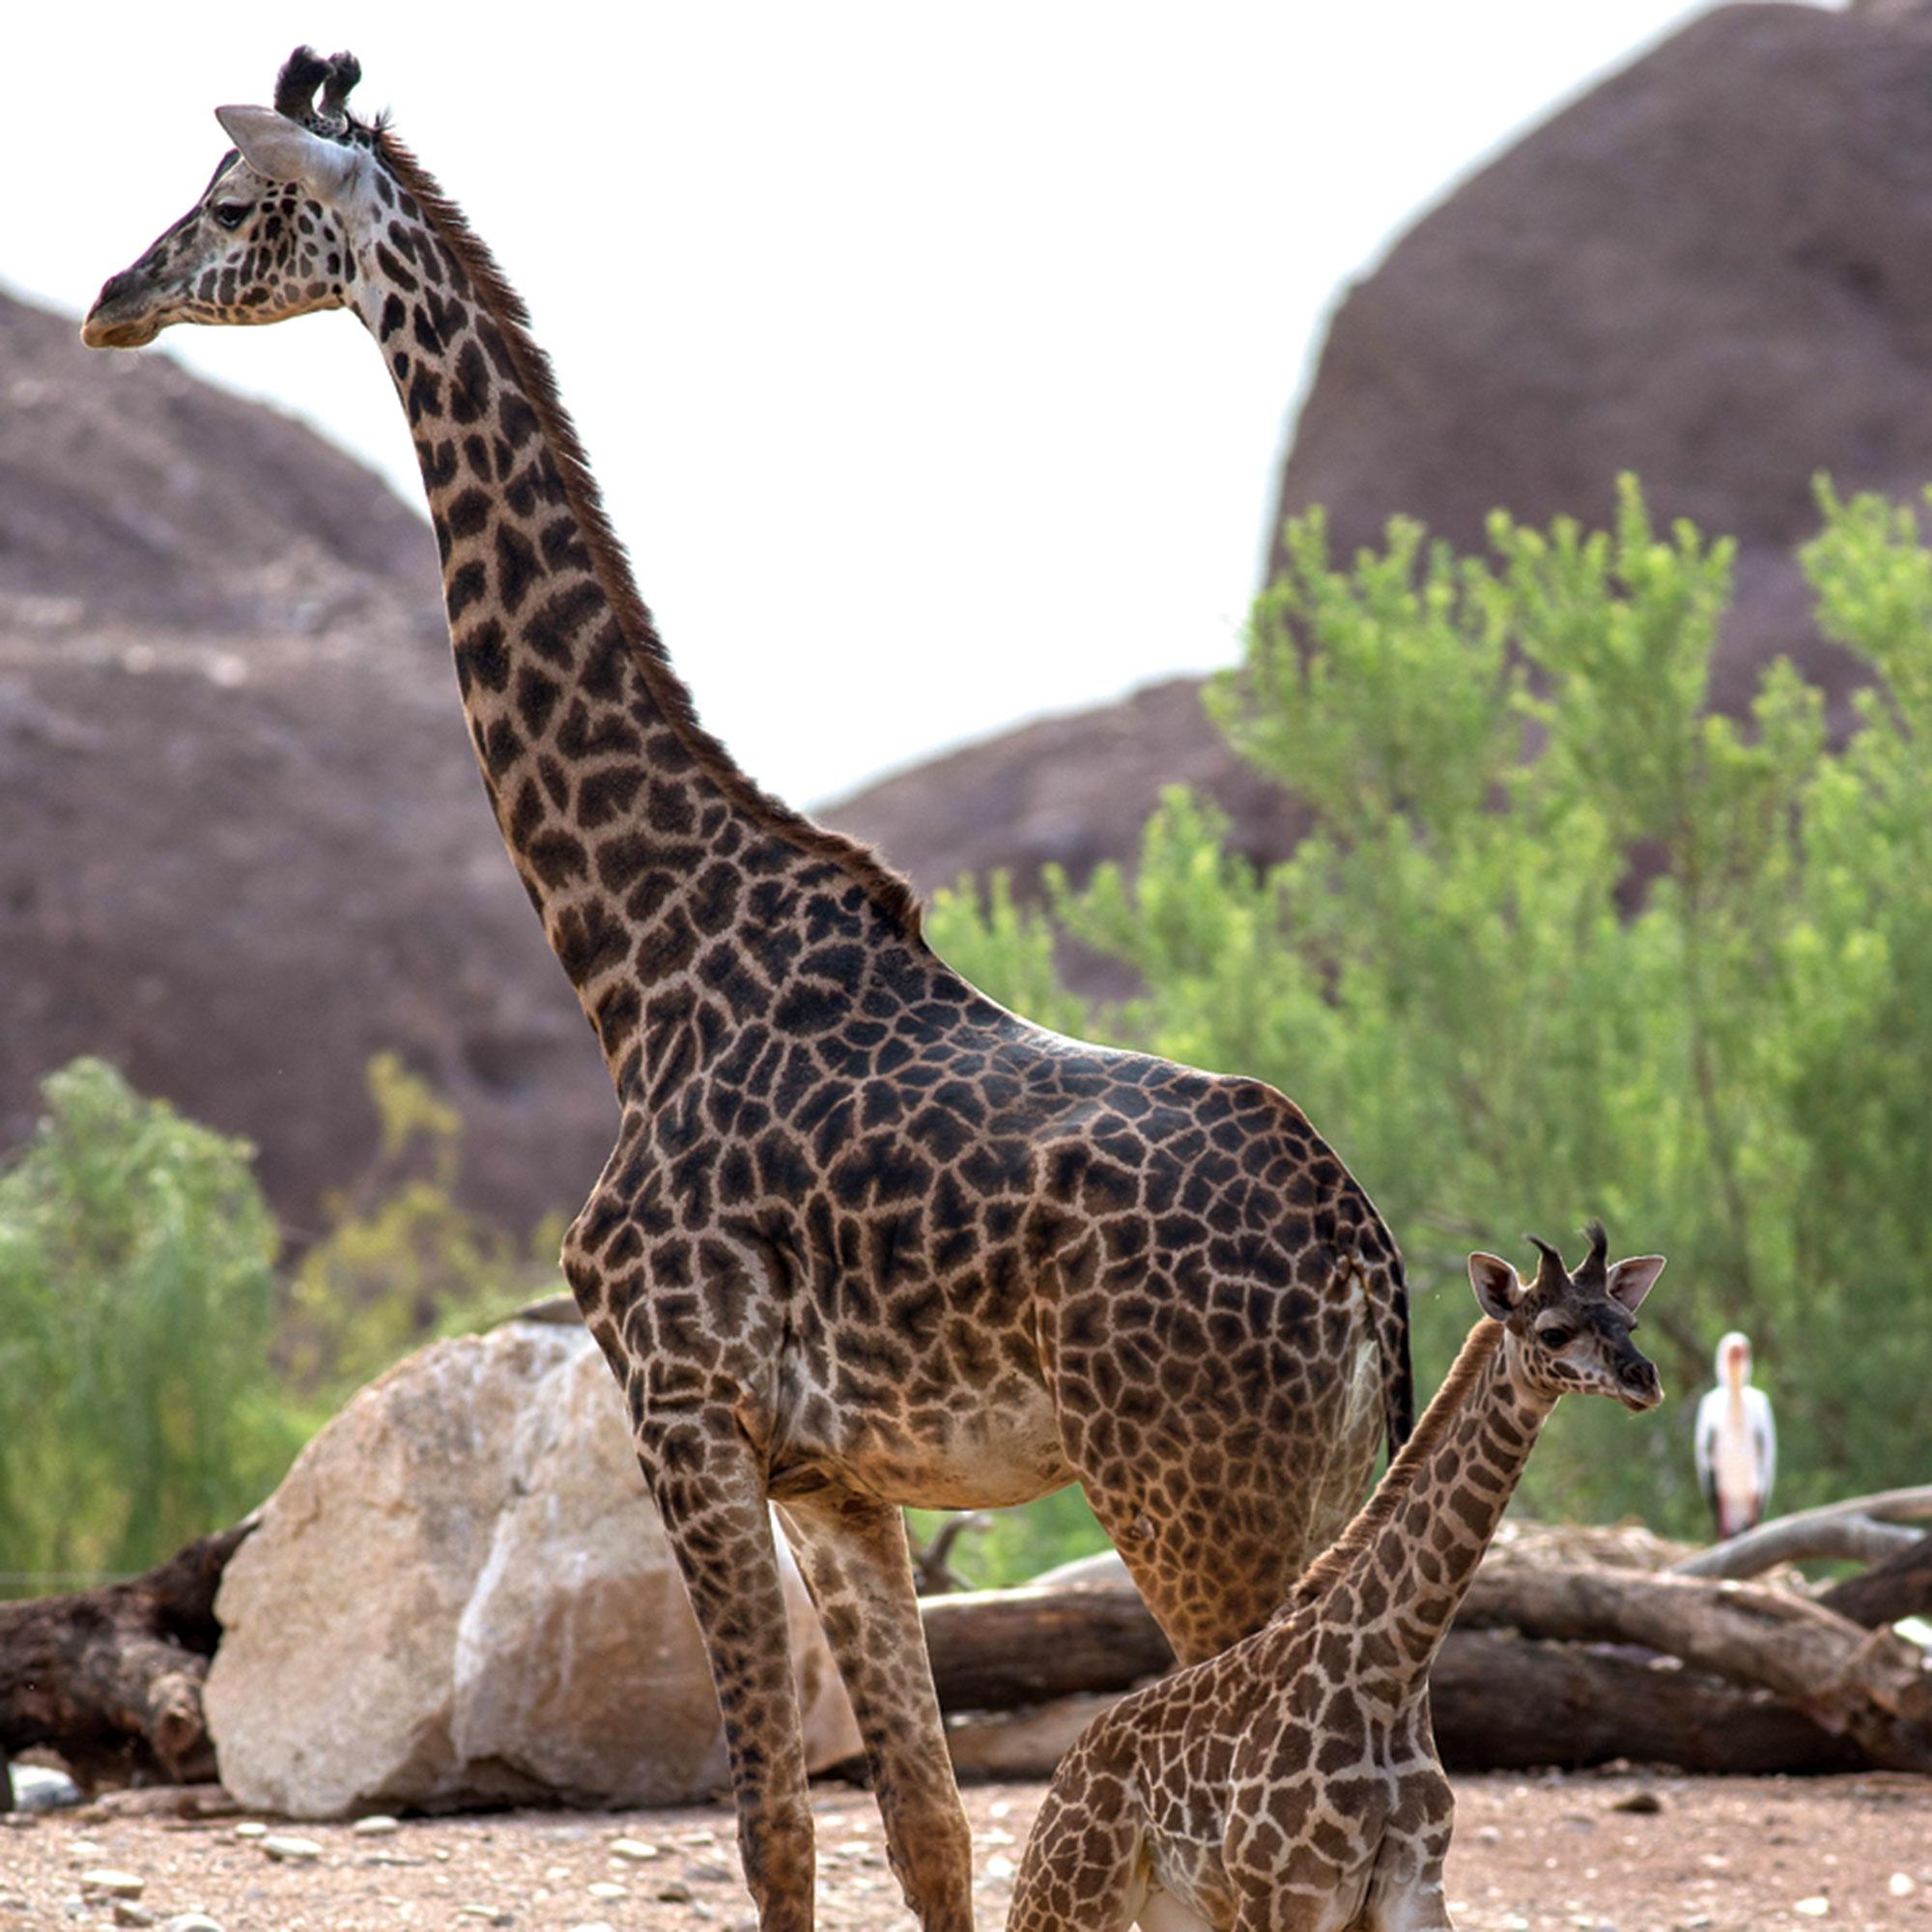 Photo courtesy Phoenix Zoo